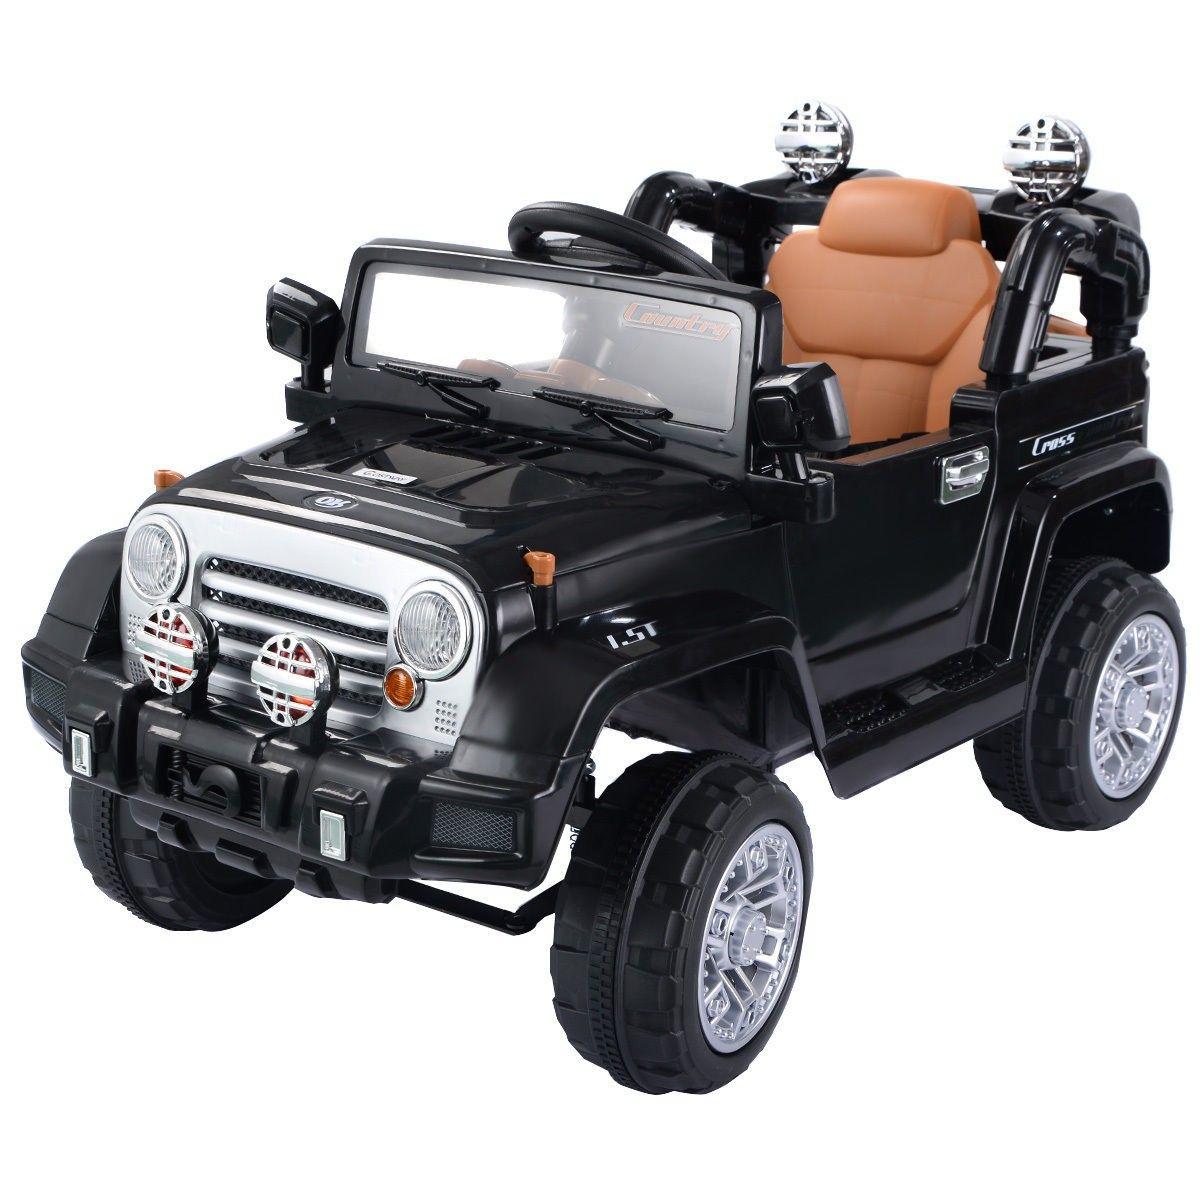 12V MP3 Kids Ride On Truck Jeep Car RC Remote Control w